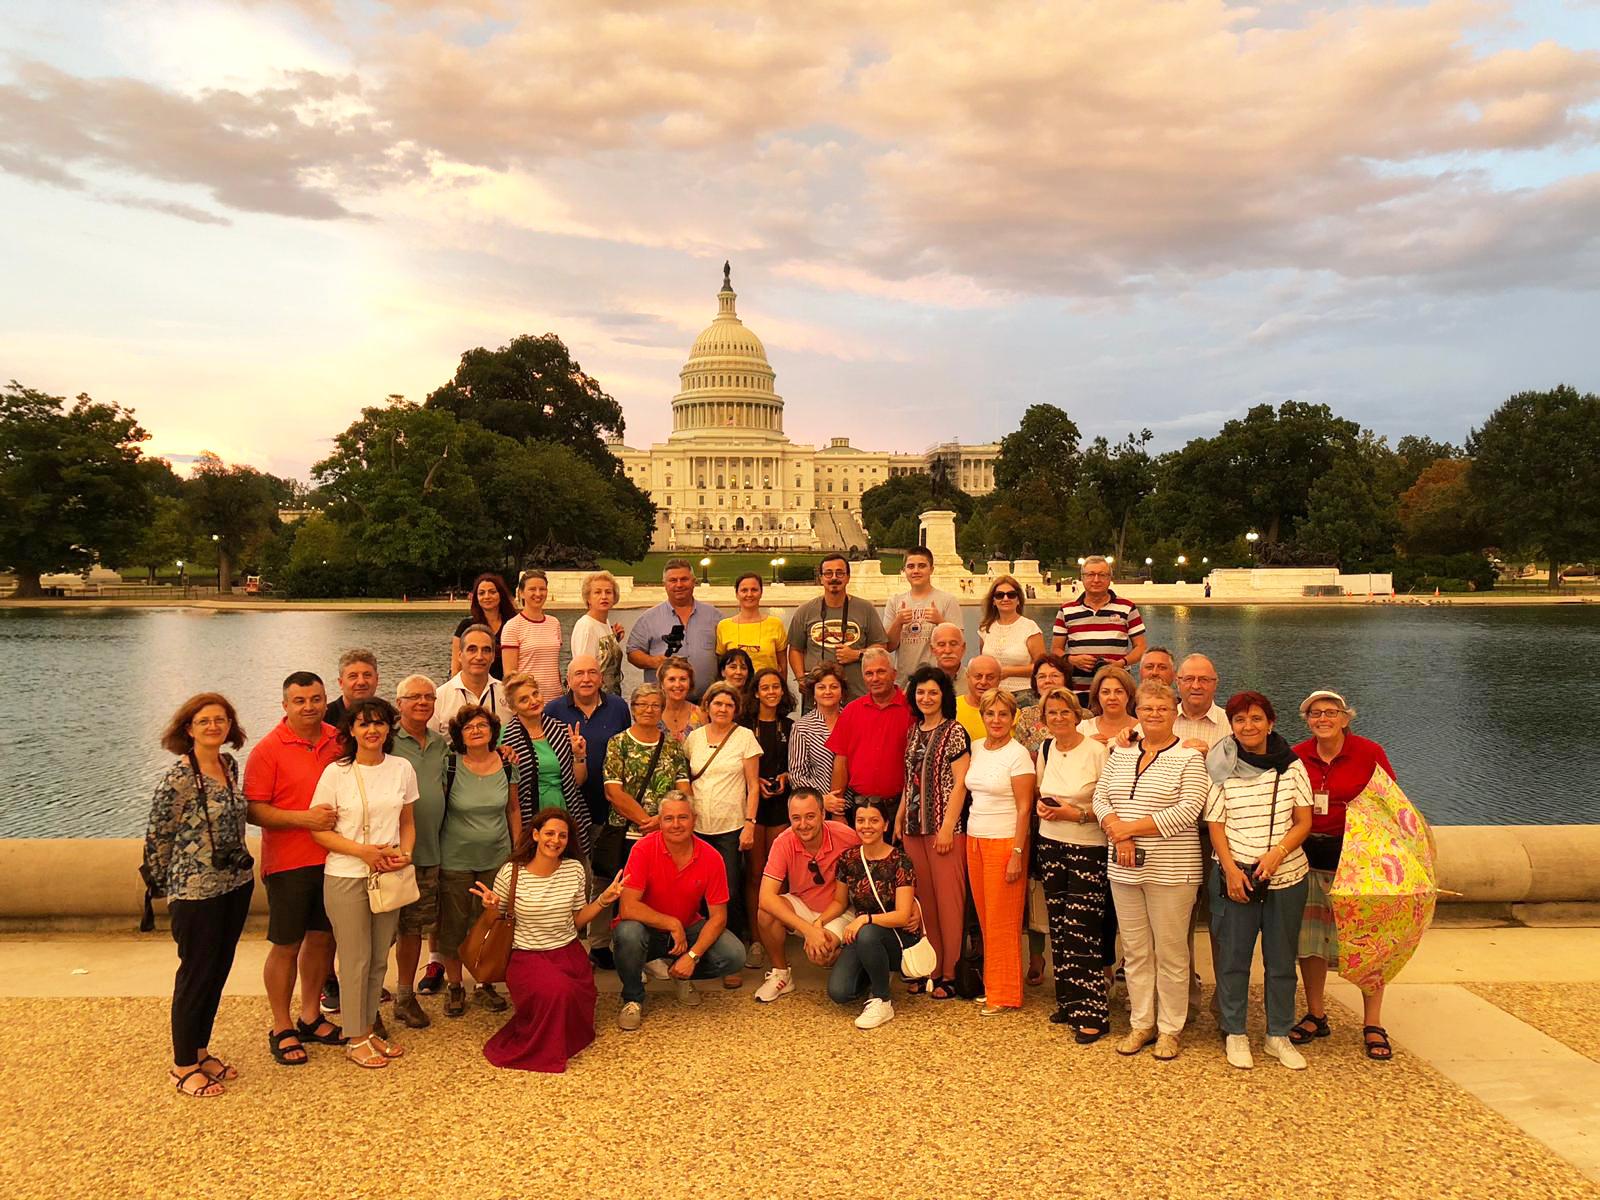 SUA Washingthon Capitoliu